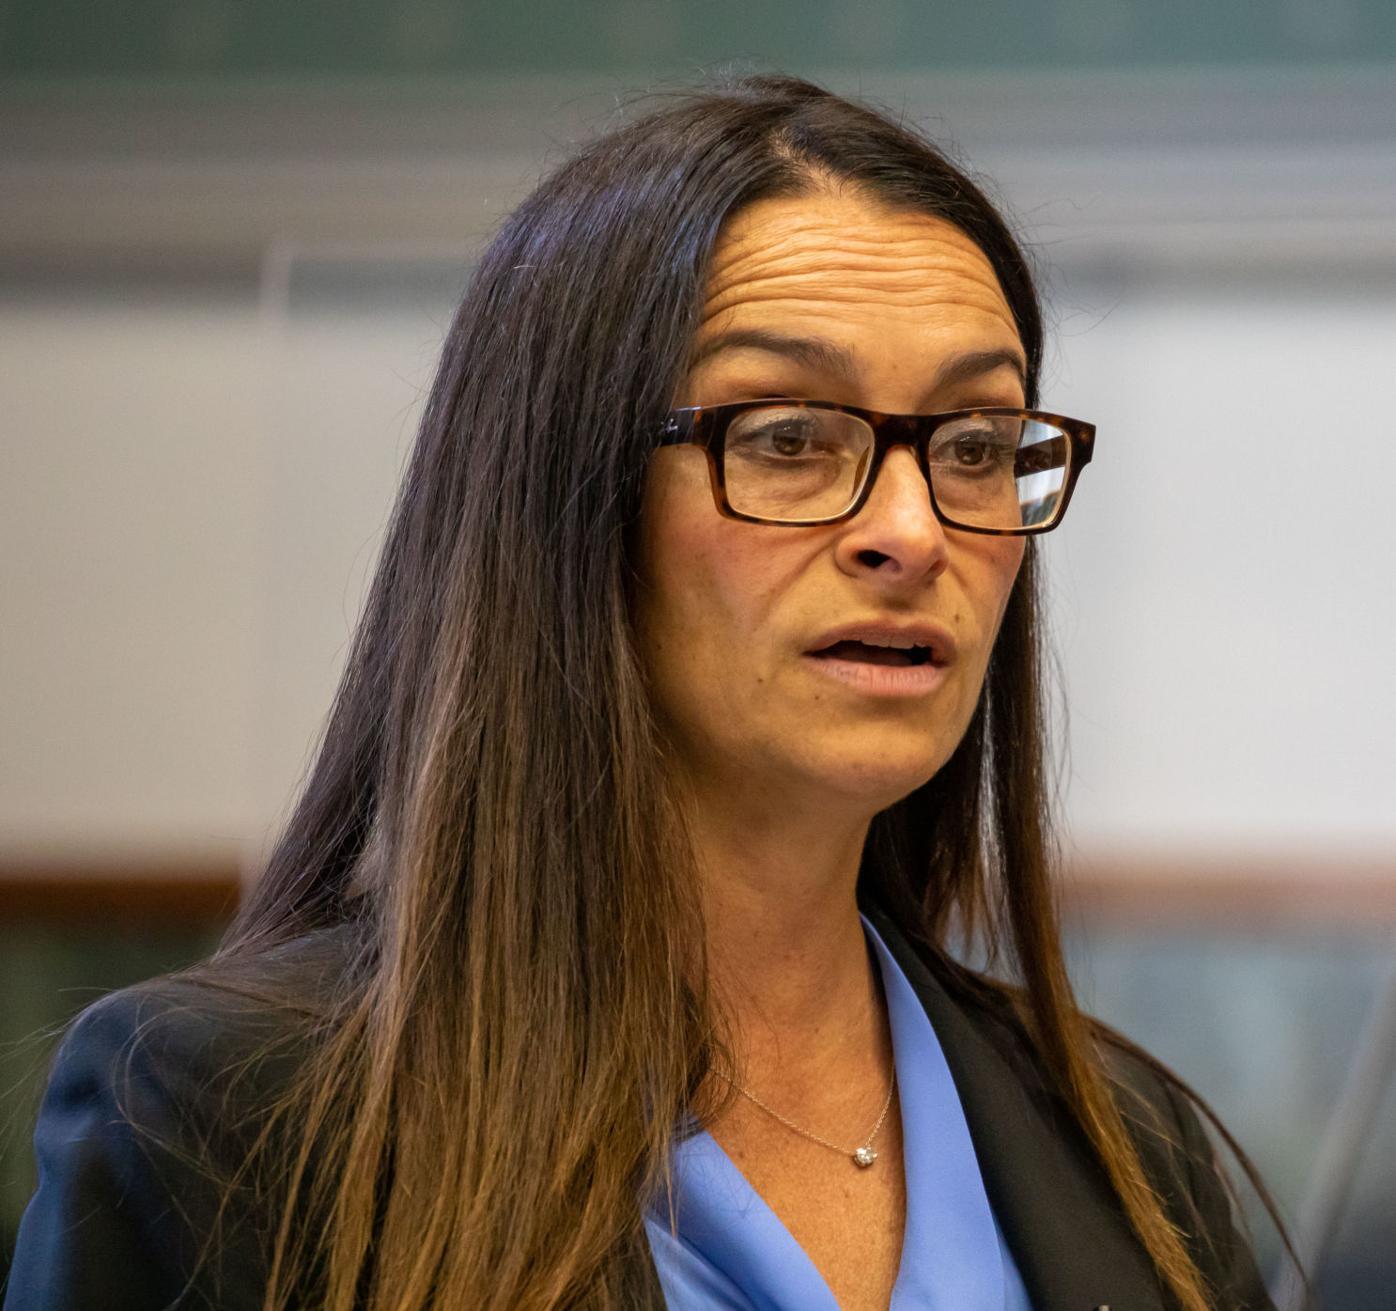 Gina Renzelli